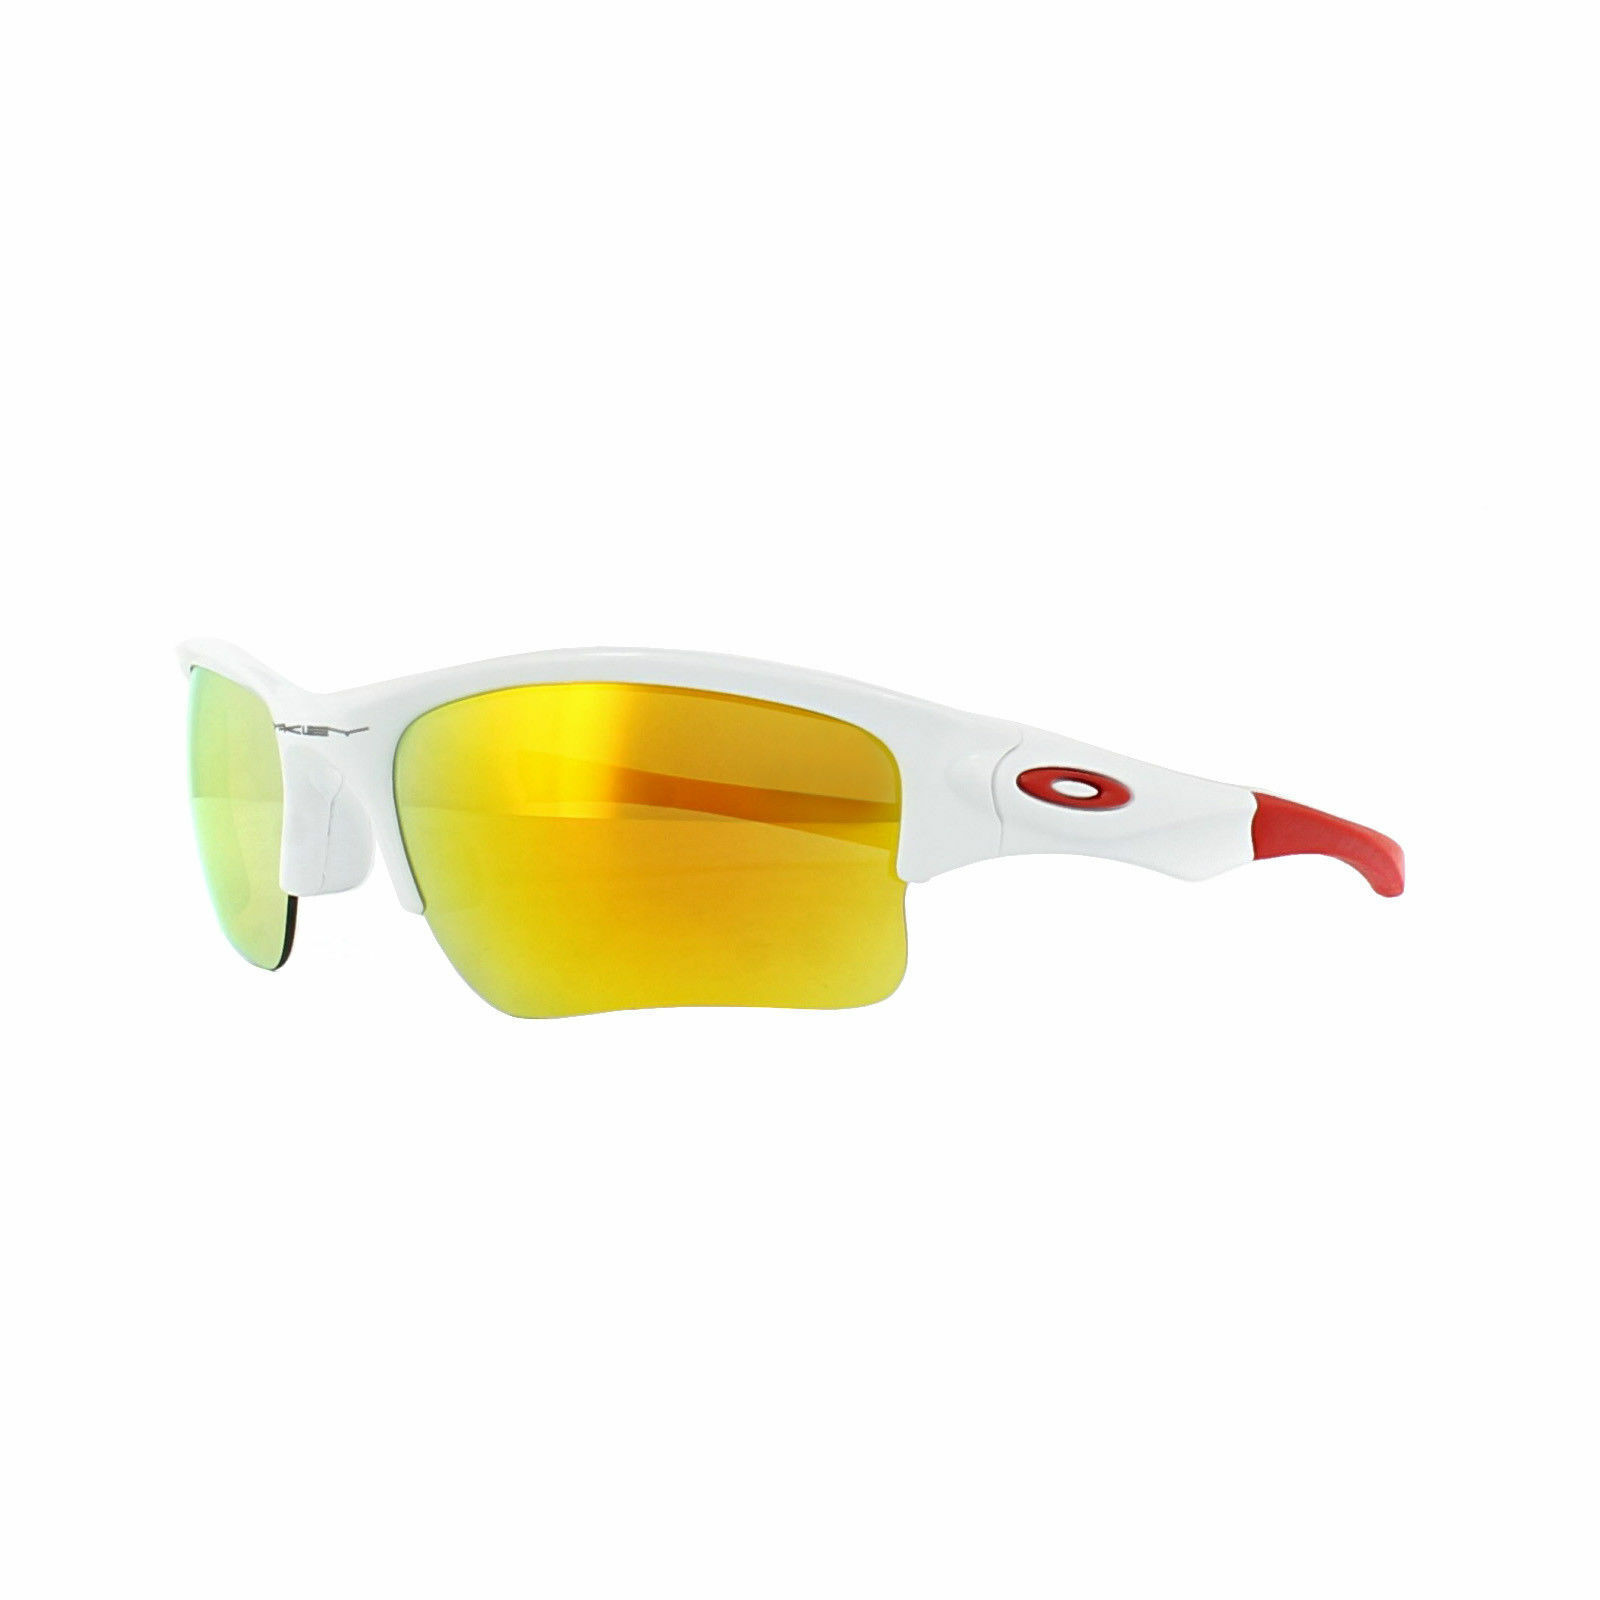 oakley-quarter-jacket-youth-sunglasses-oo9200-03-polished-white-w-fire-iridium